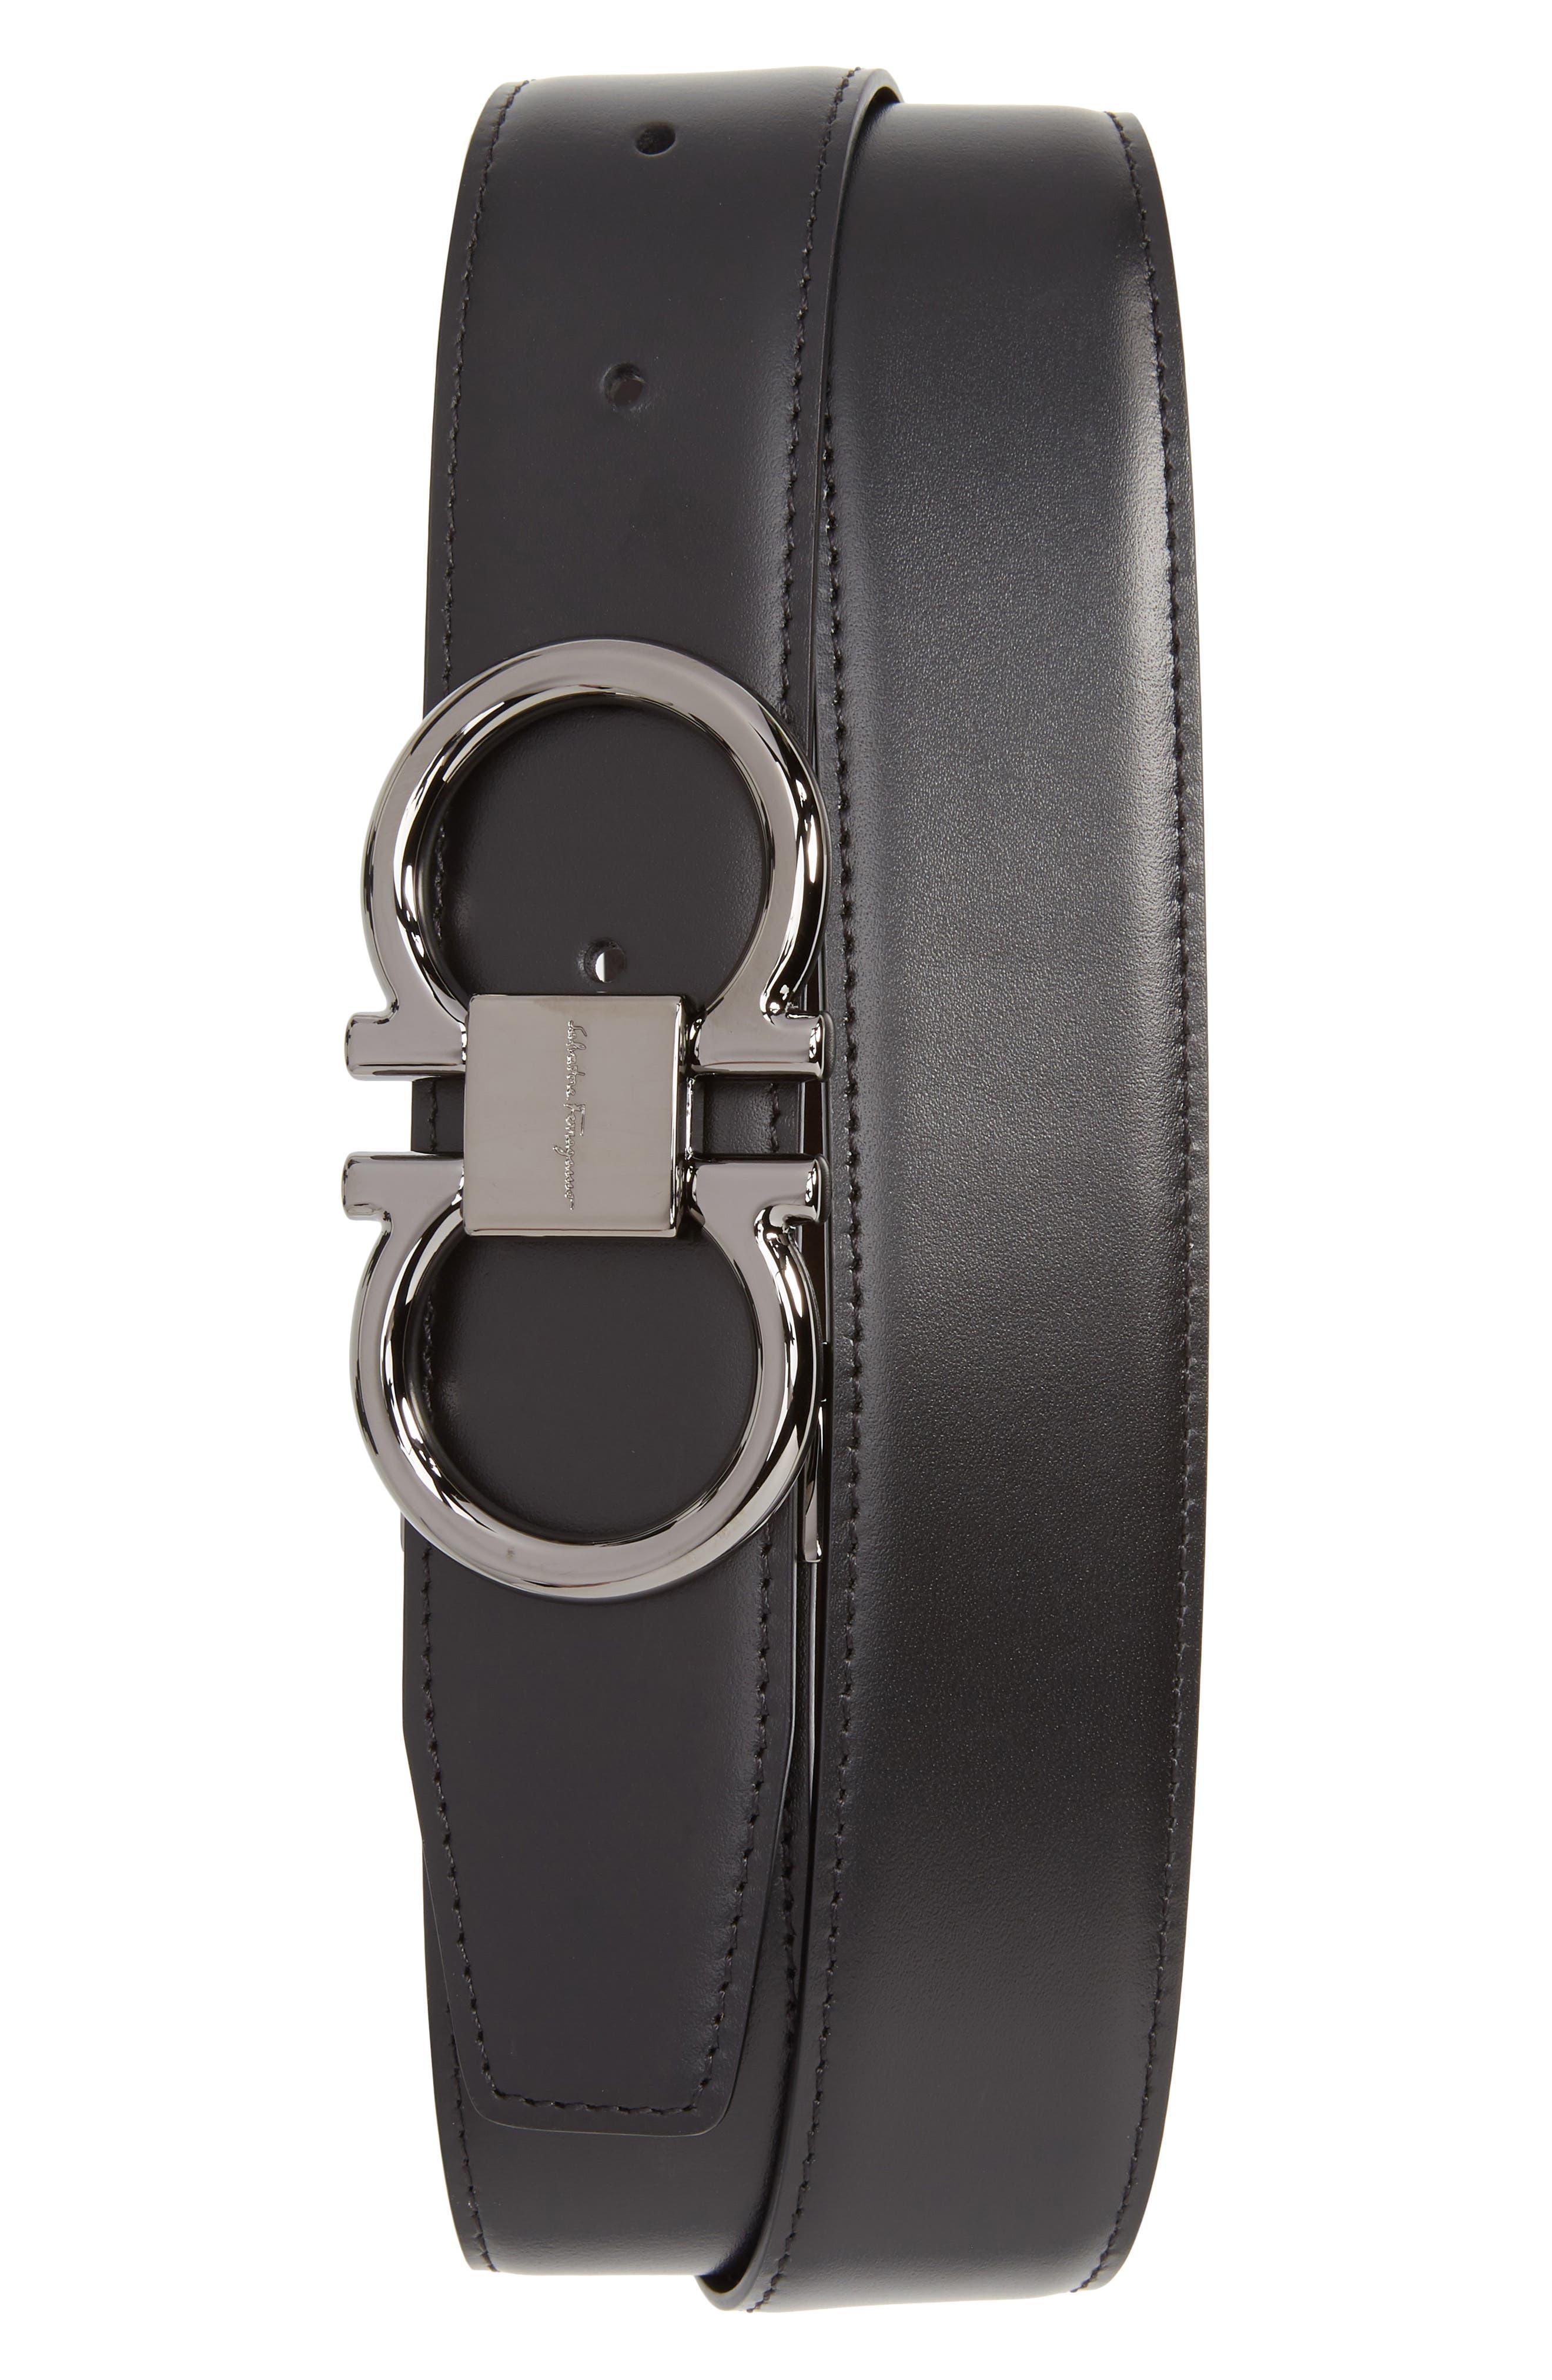 Gancio Reversible Calfskin Leather Belt,                         Main,                         color, BLACK/ HICKORY